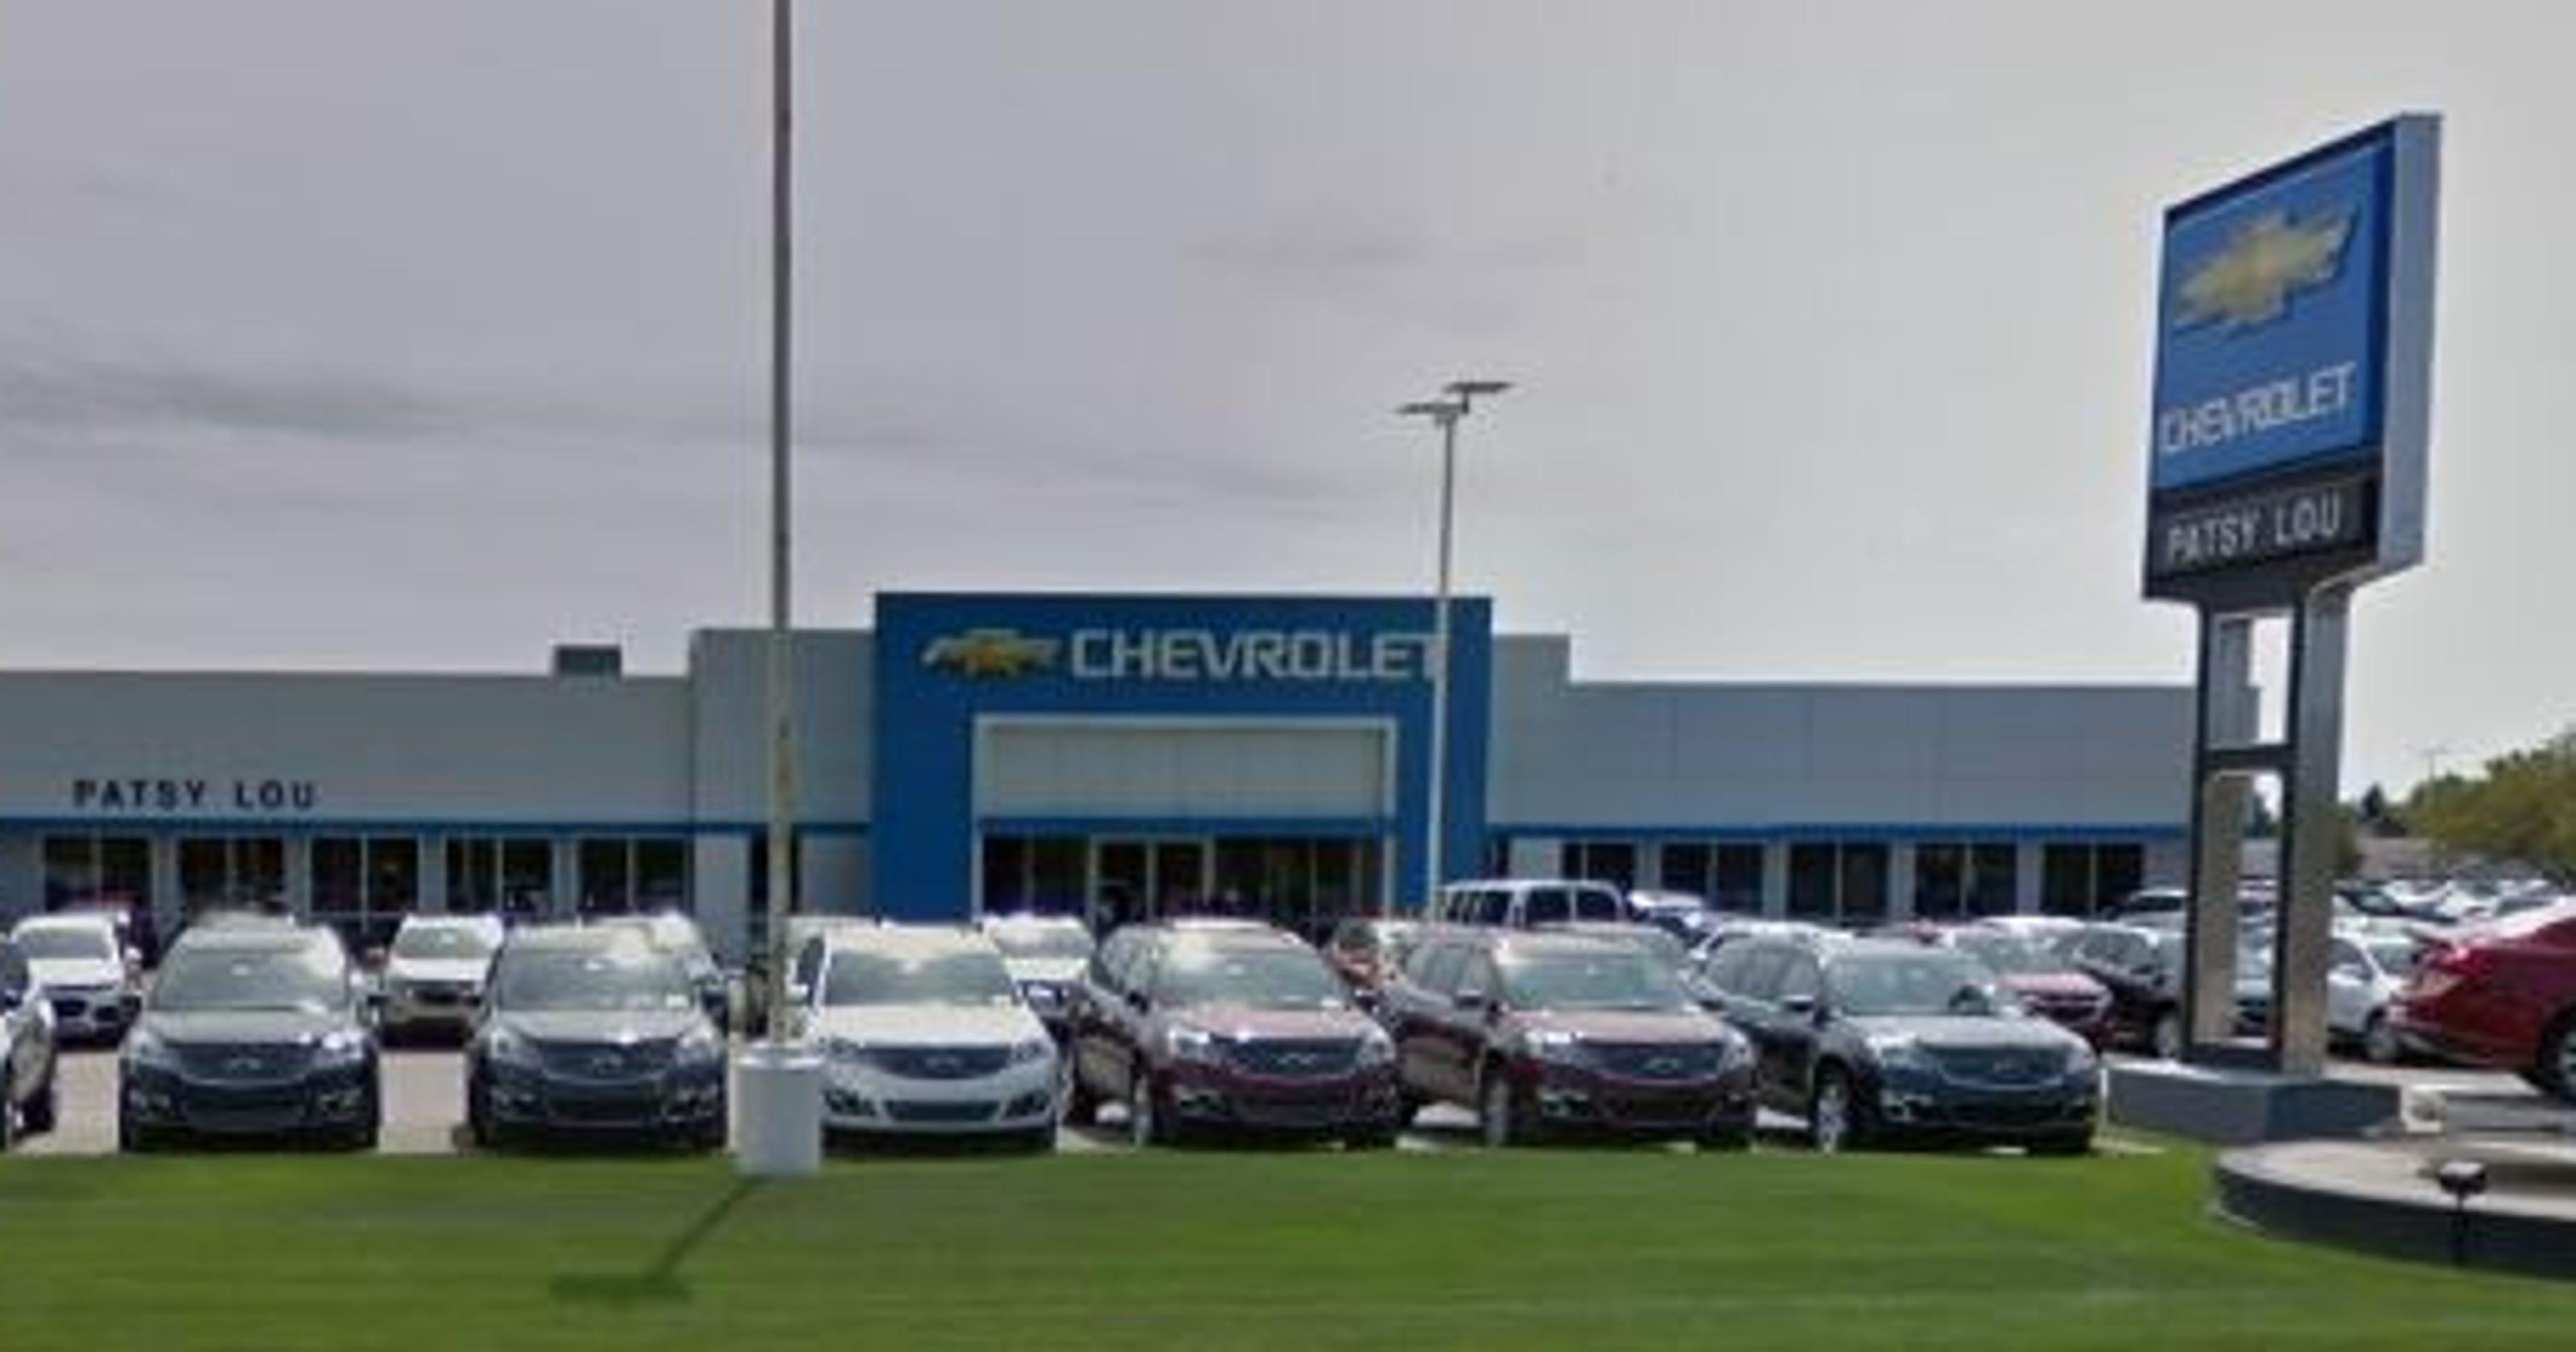 Michigan Suspends License Of Patsy Lou Chevrolet